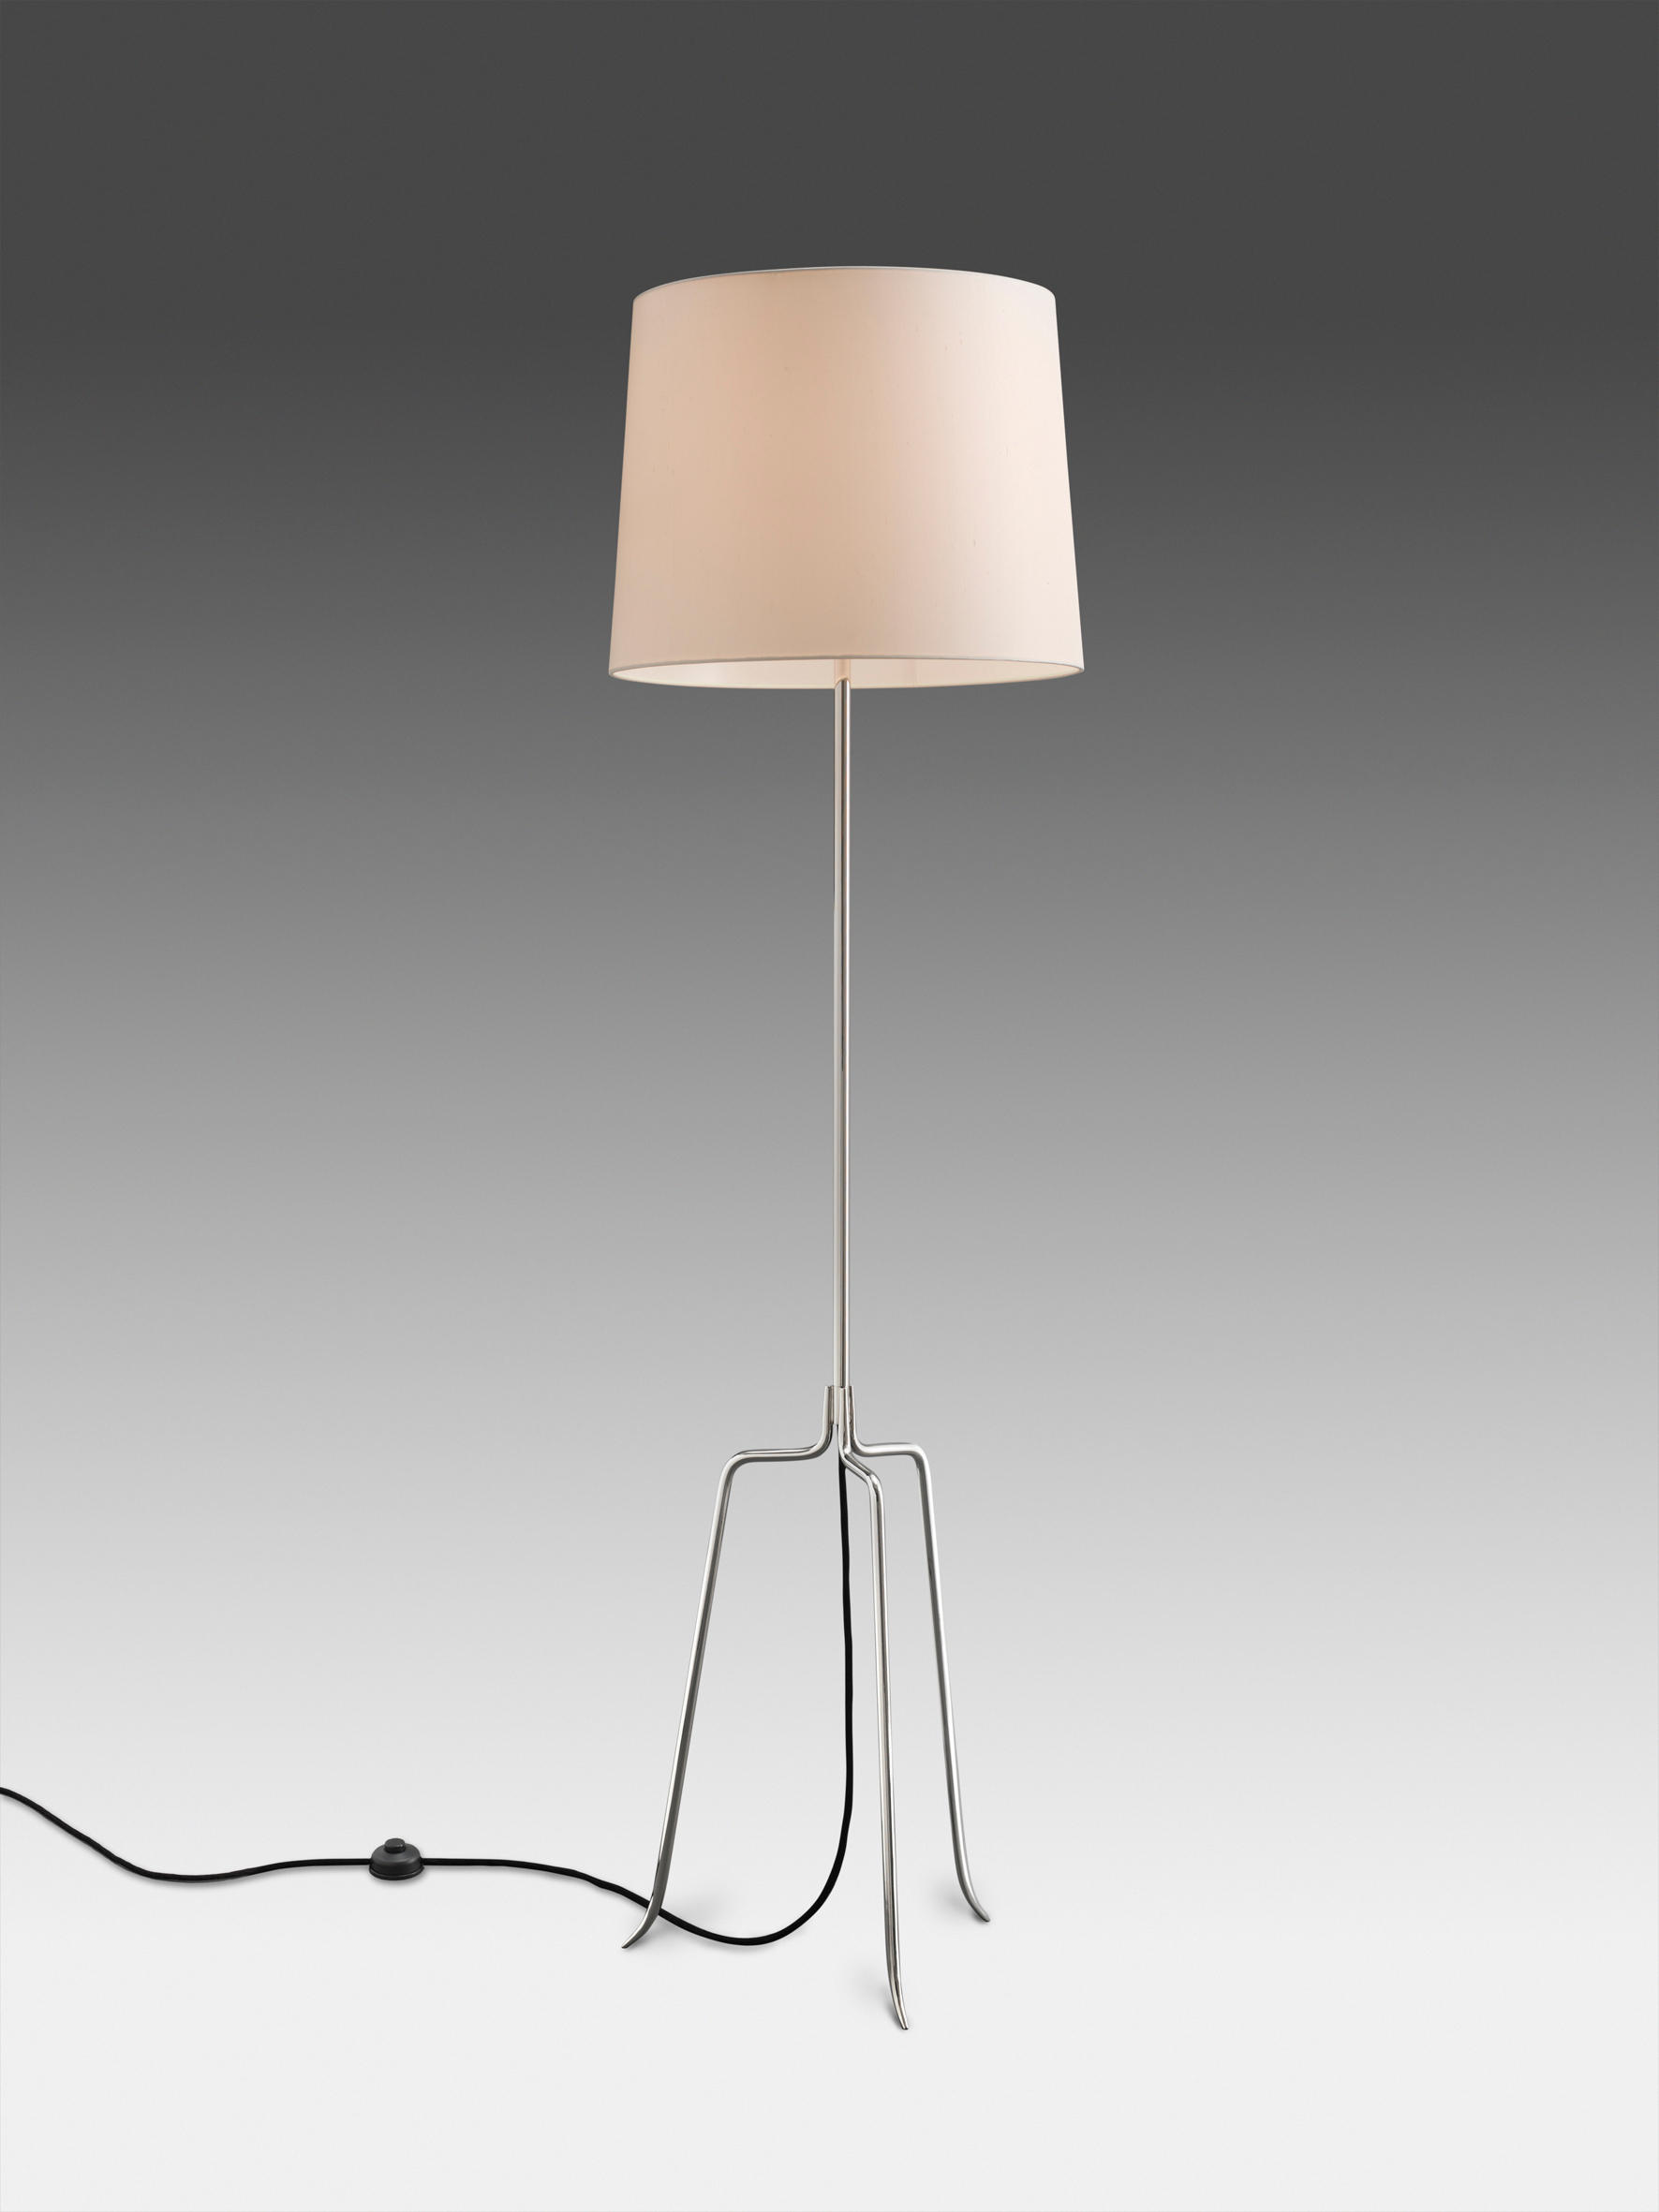 dreistelz floor lamp free standing lights from kalmar. Black Bedroom Furniture Sets. Home Design Ideas